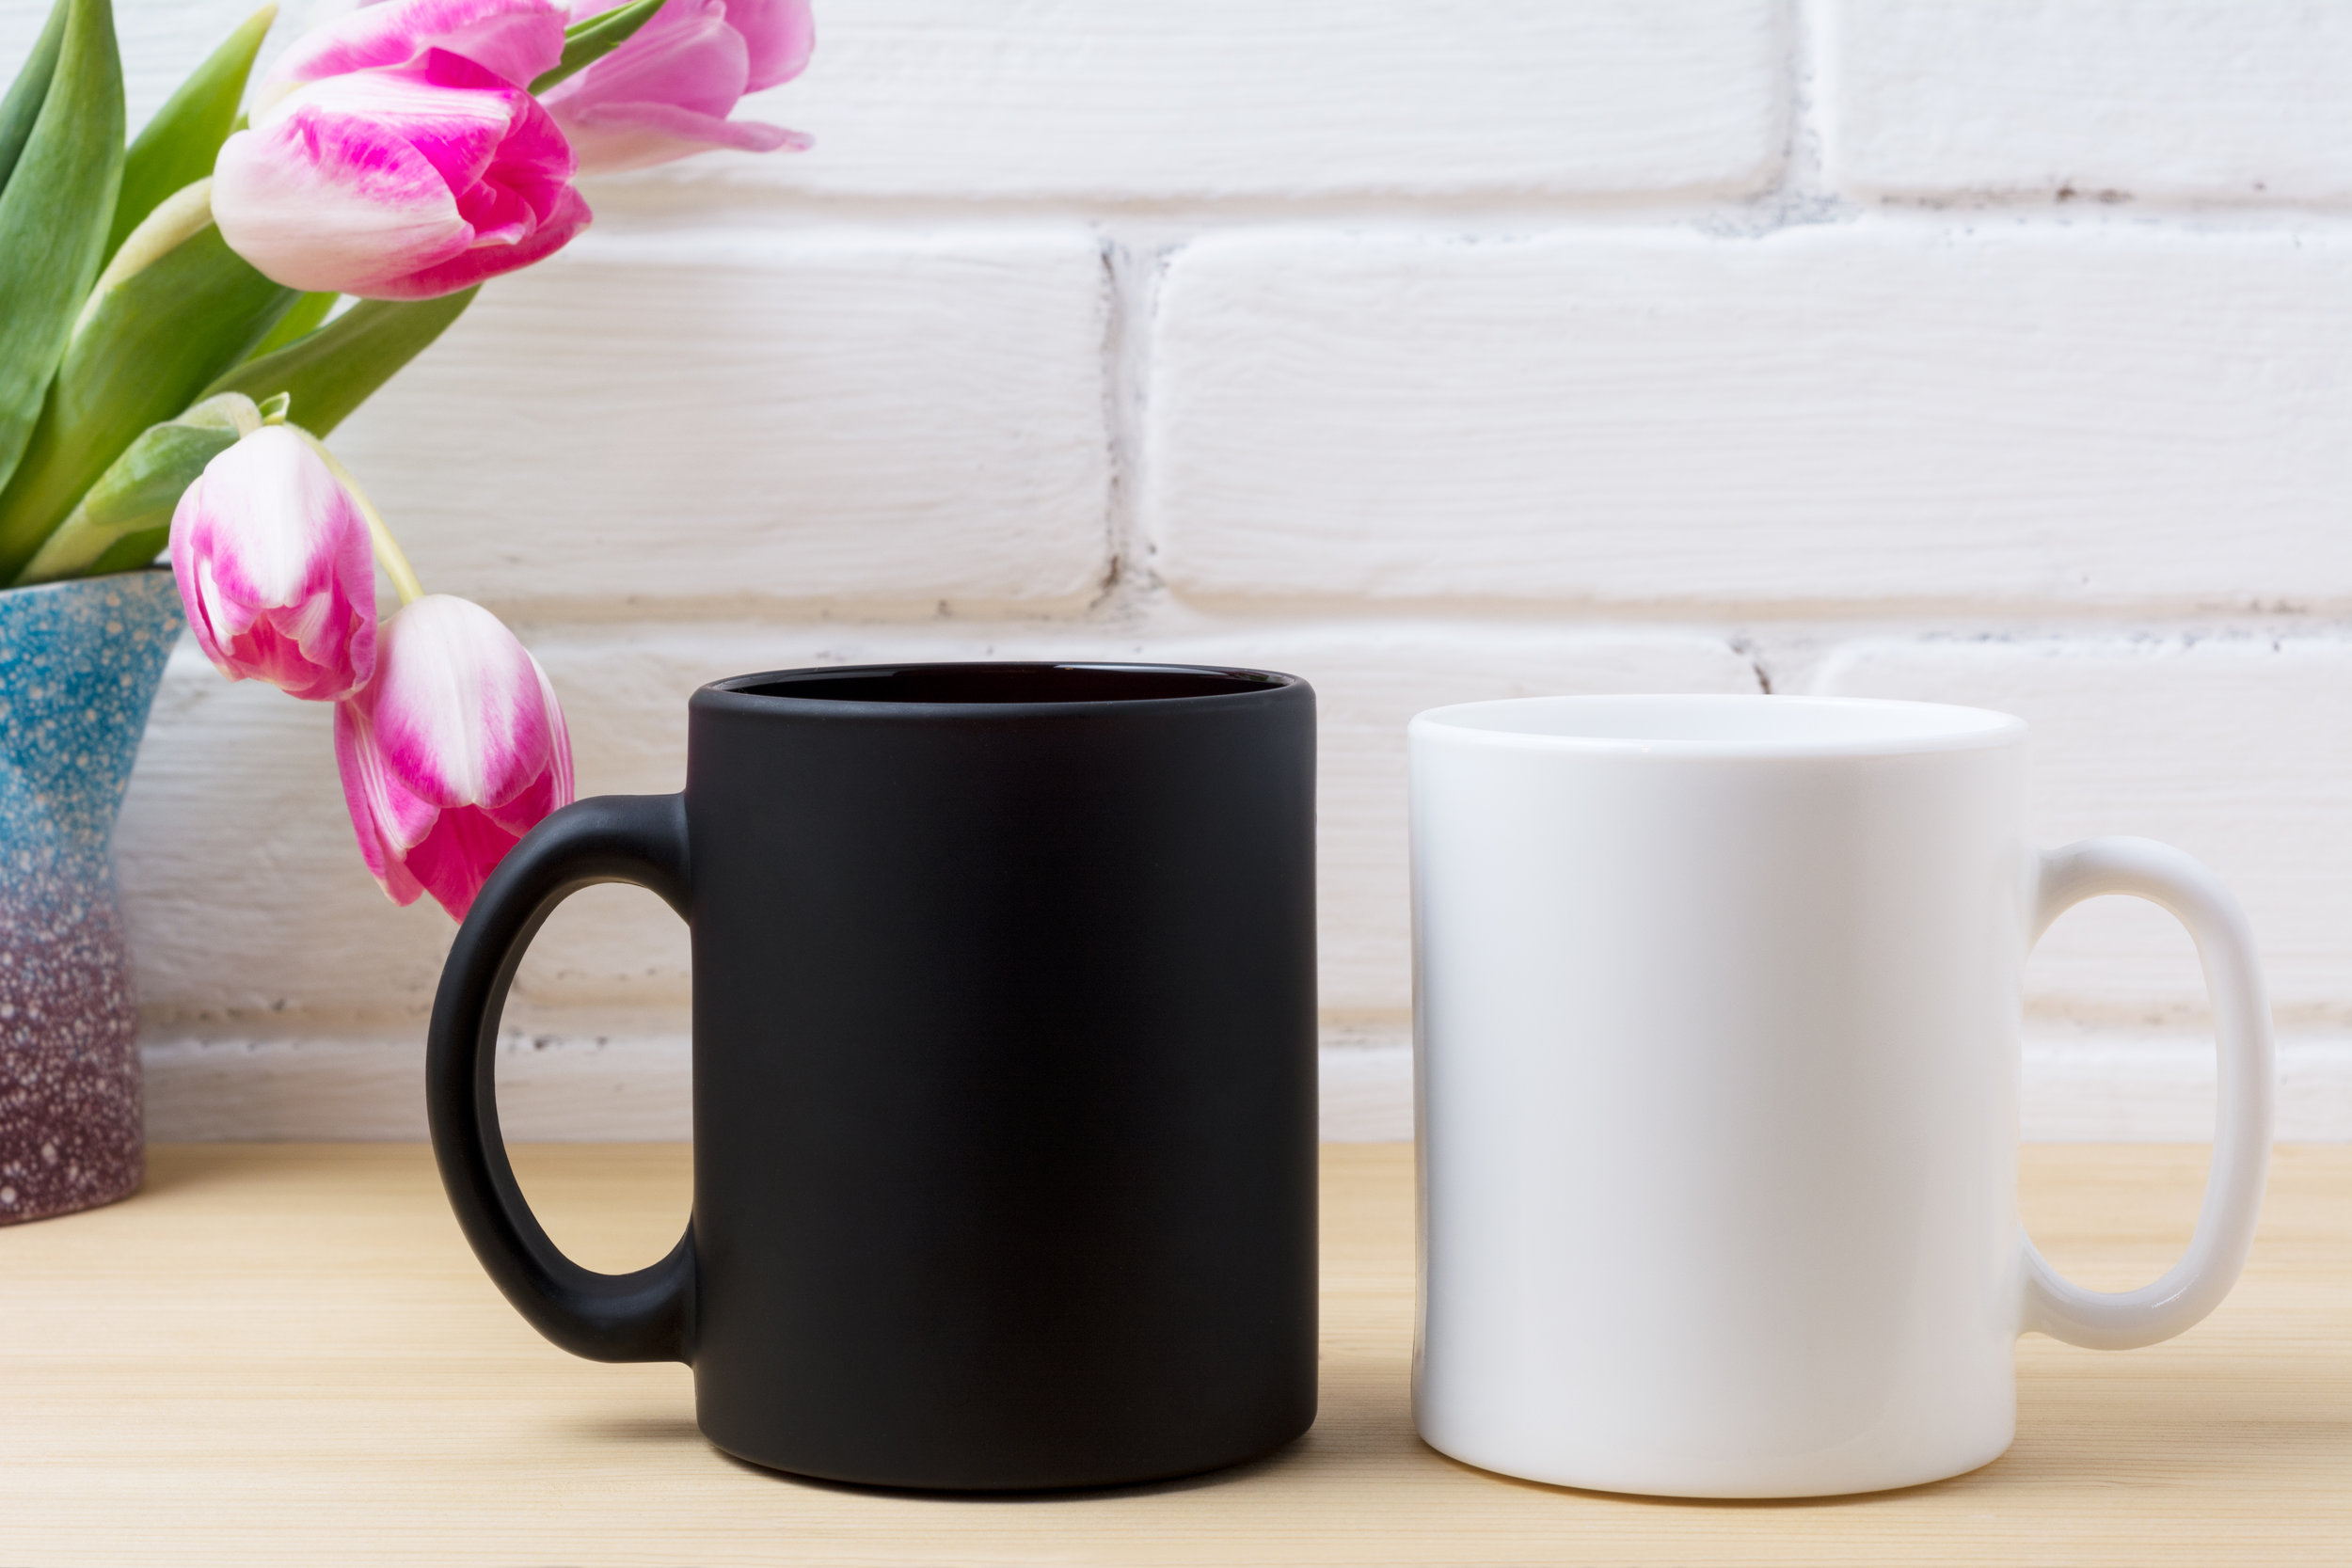 black-coffee-mug-and-white-cappuccino-cup-mockup-PHKSENC.jpg